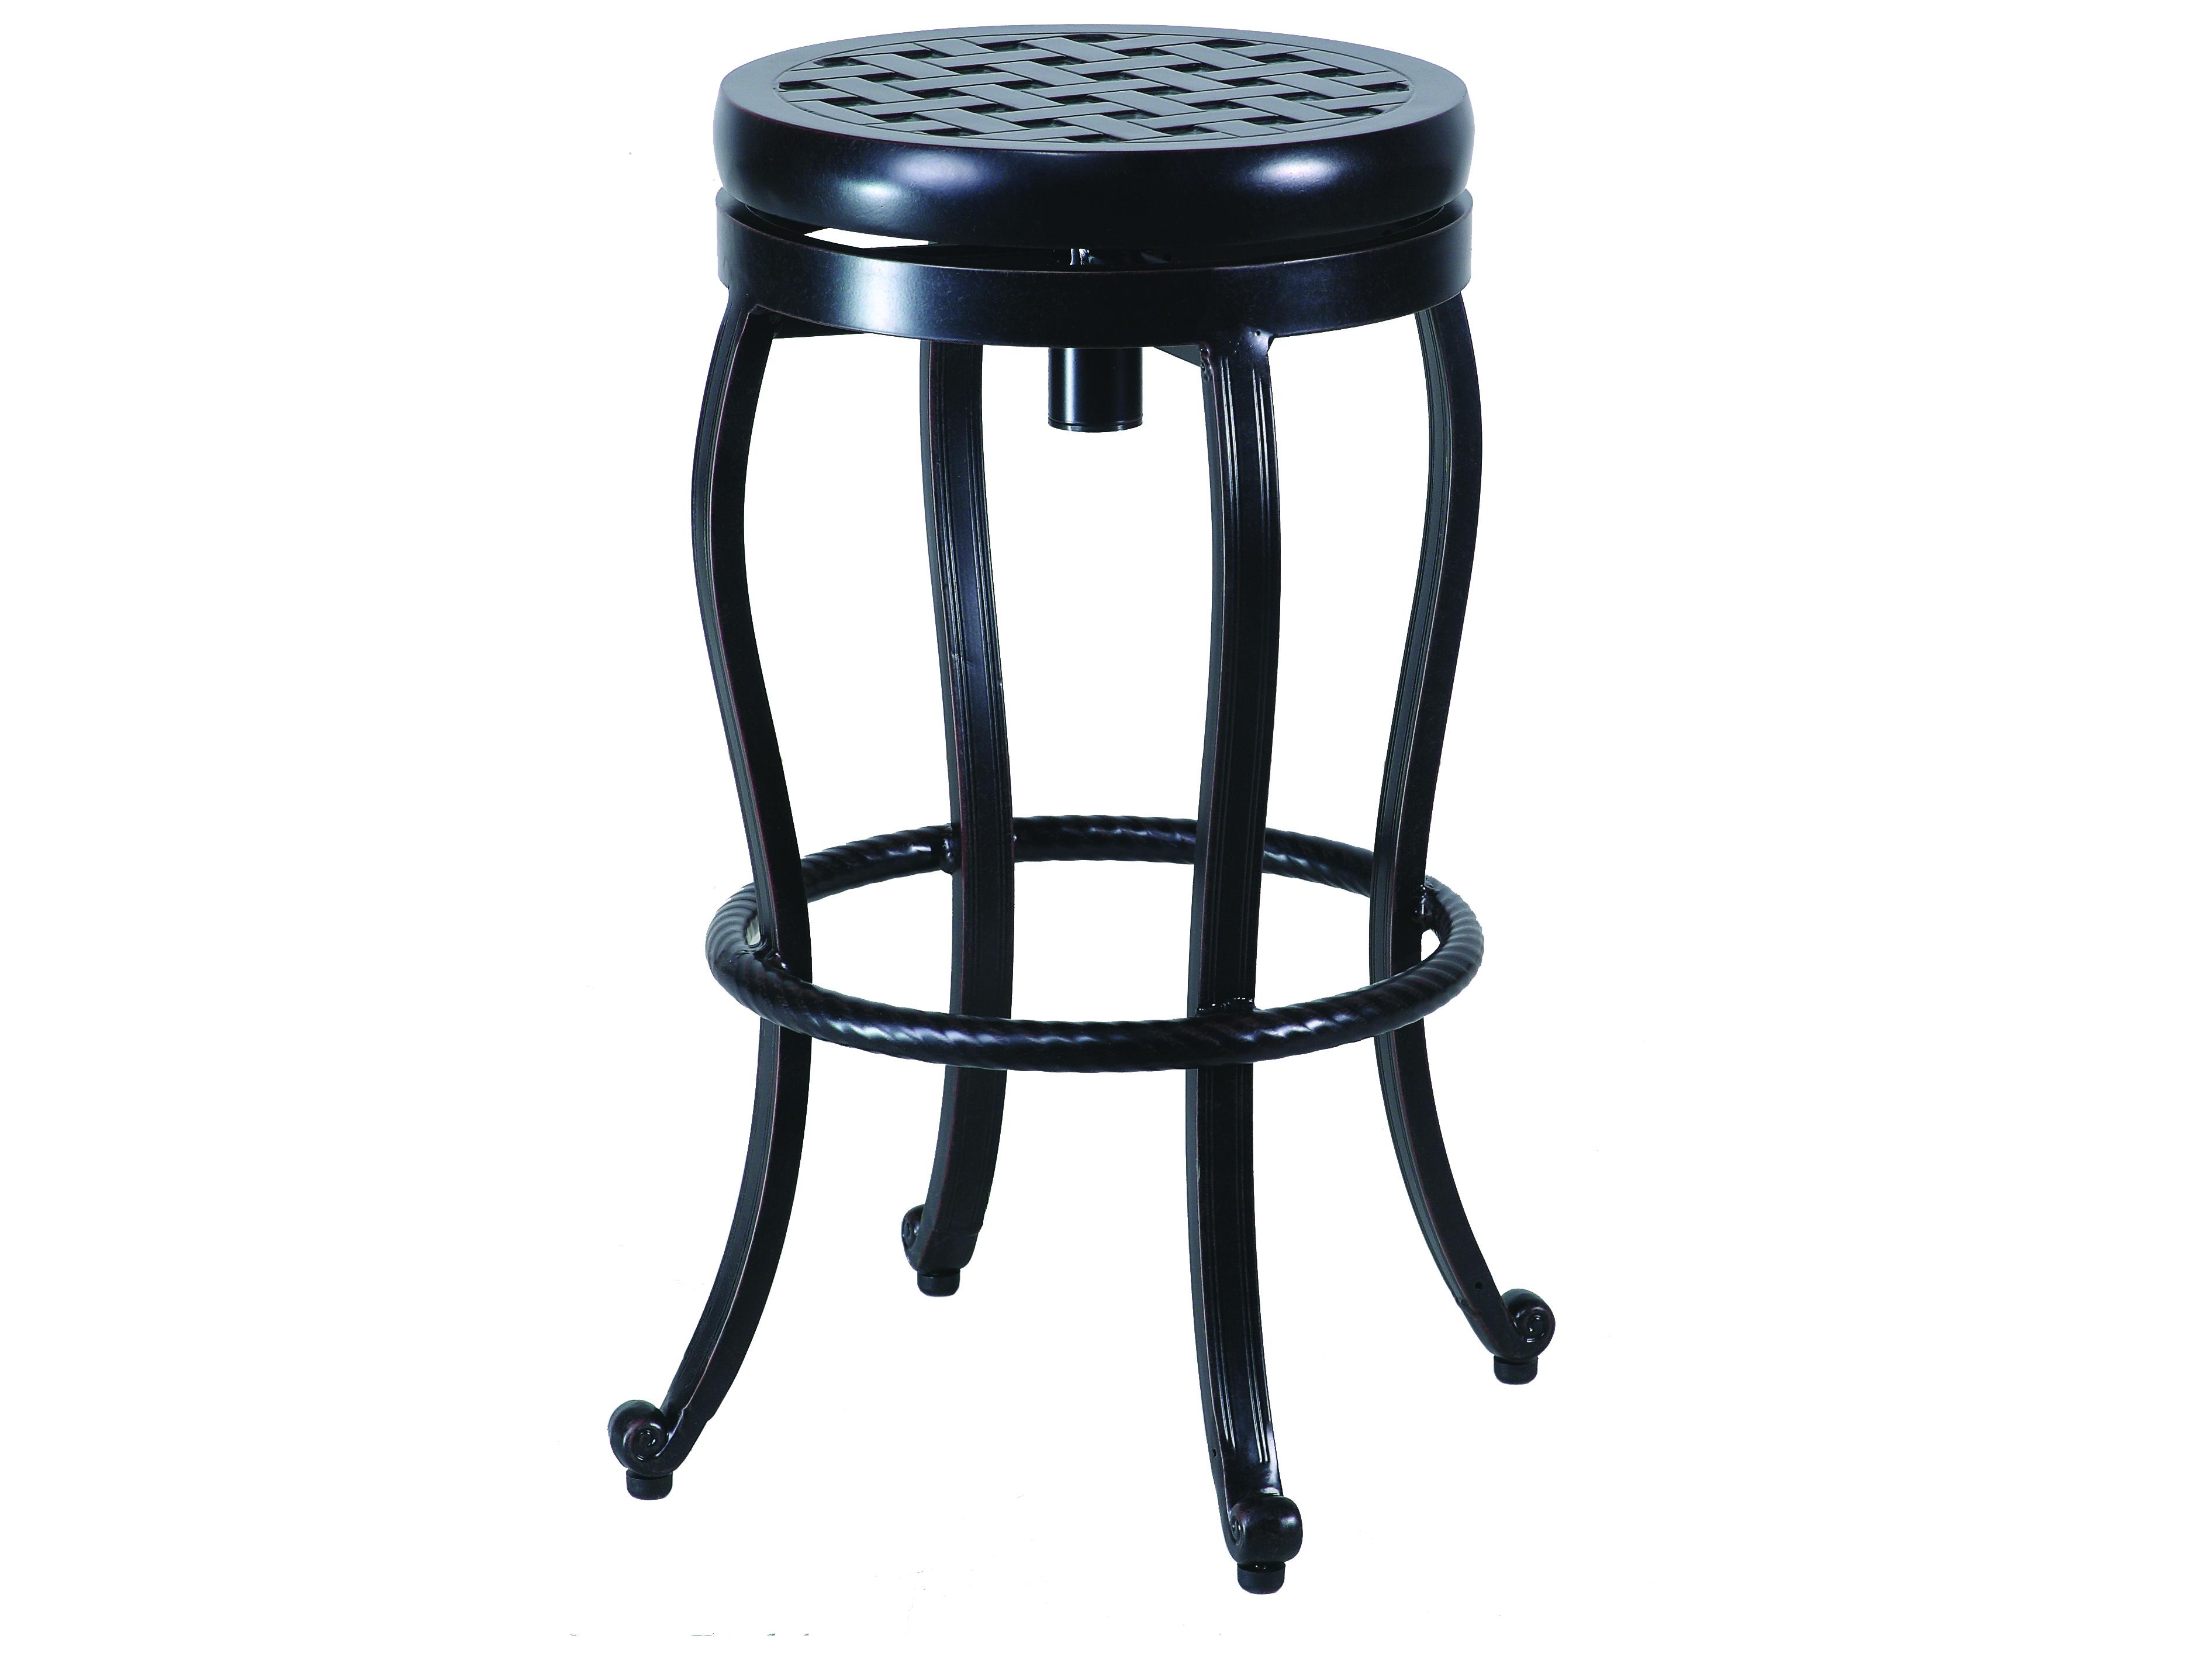 gensun cast aluminum backless swivel bar stool acce0047. Black Bedroom Furniture Sets. Home Design Ideas